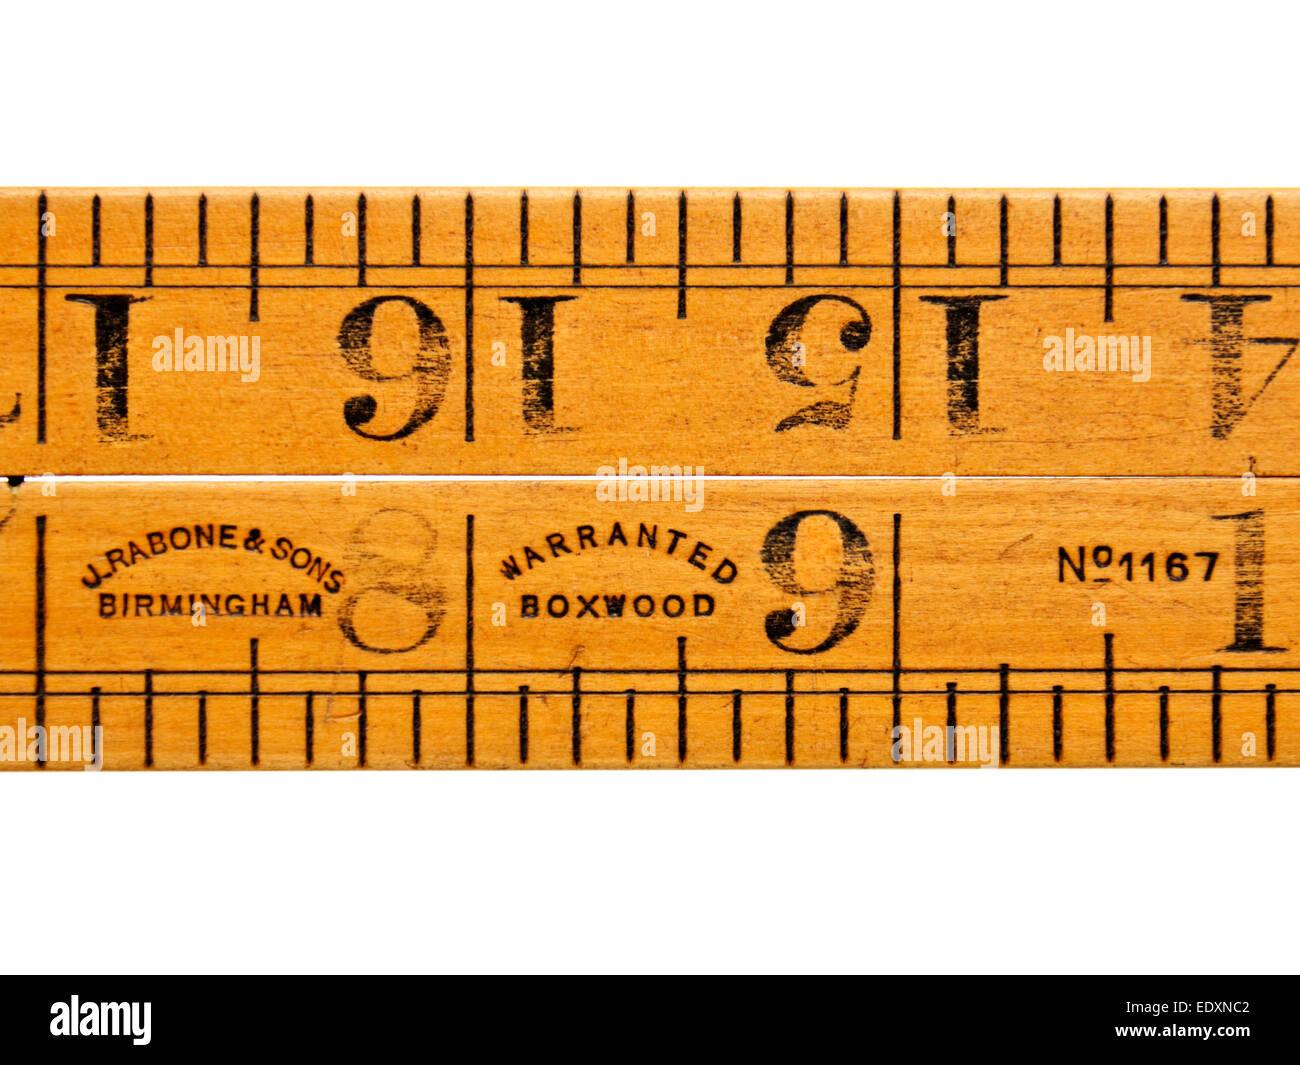 Antique (c.1890) boxwood folding rule No 1167 by John Rabone & Sons,  Birmingham, England